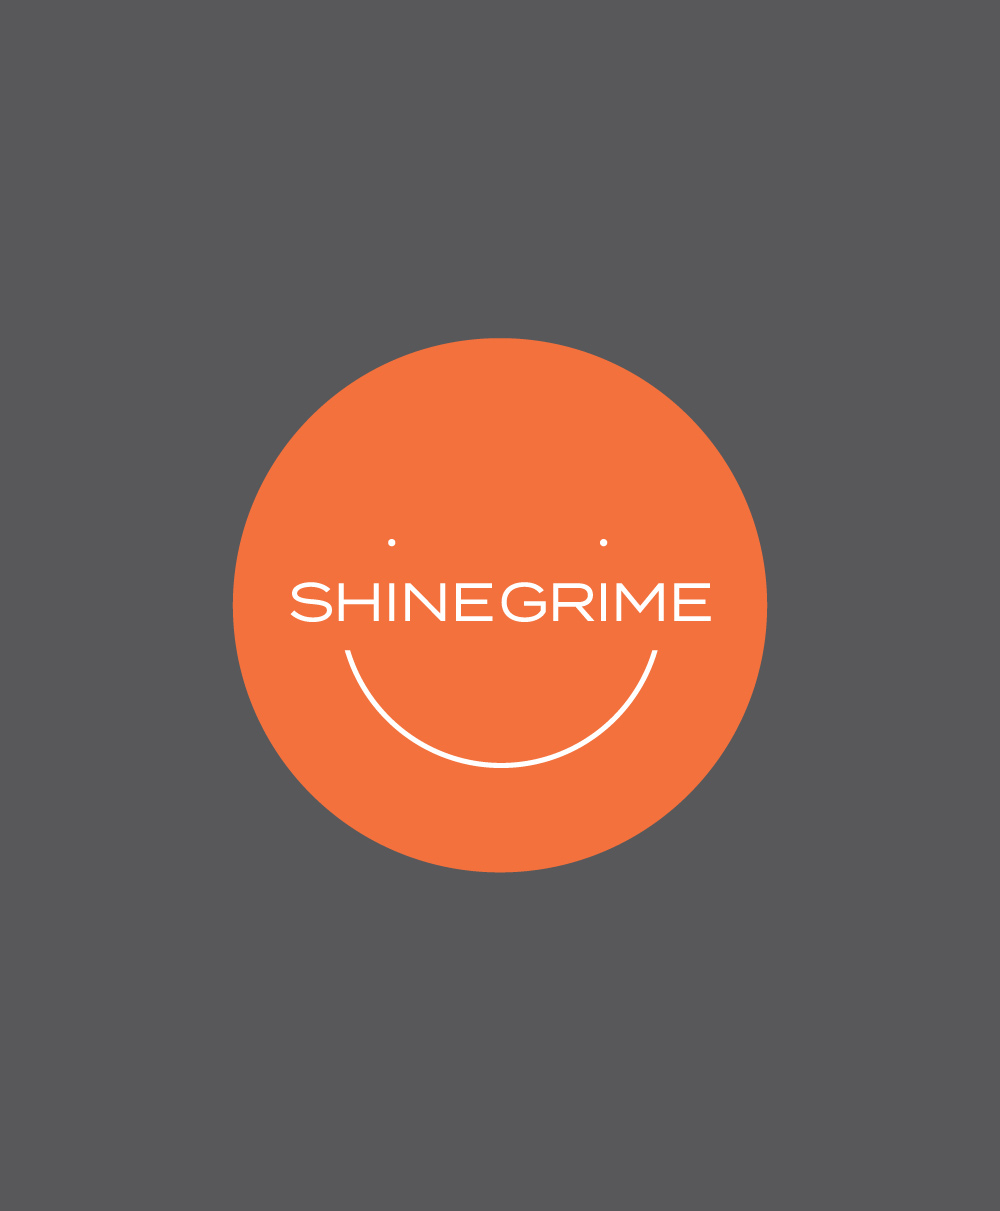 SHINE GRIME